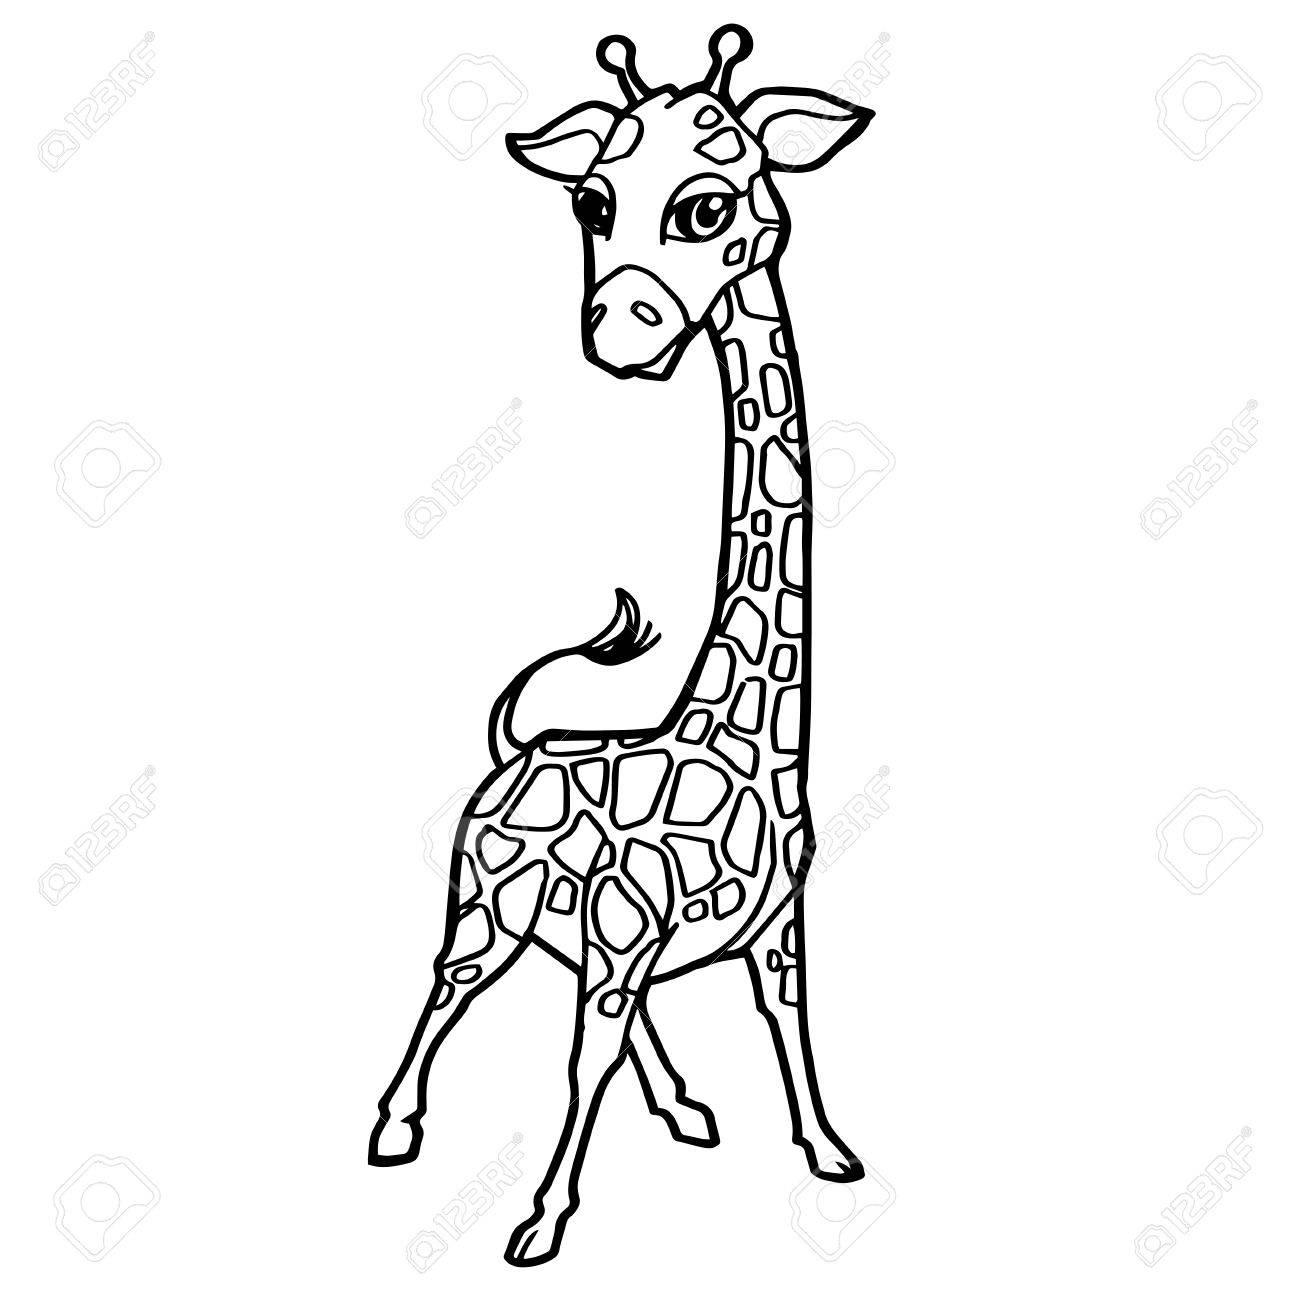 Cartoon Cute Giraffe Coloring Page Vector Illustration Royalty Free Cliparts Vectors And Stock Illustration Image 83074251